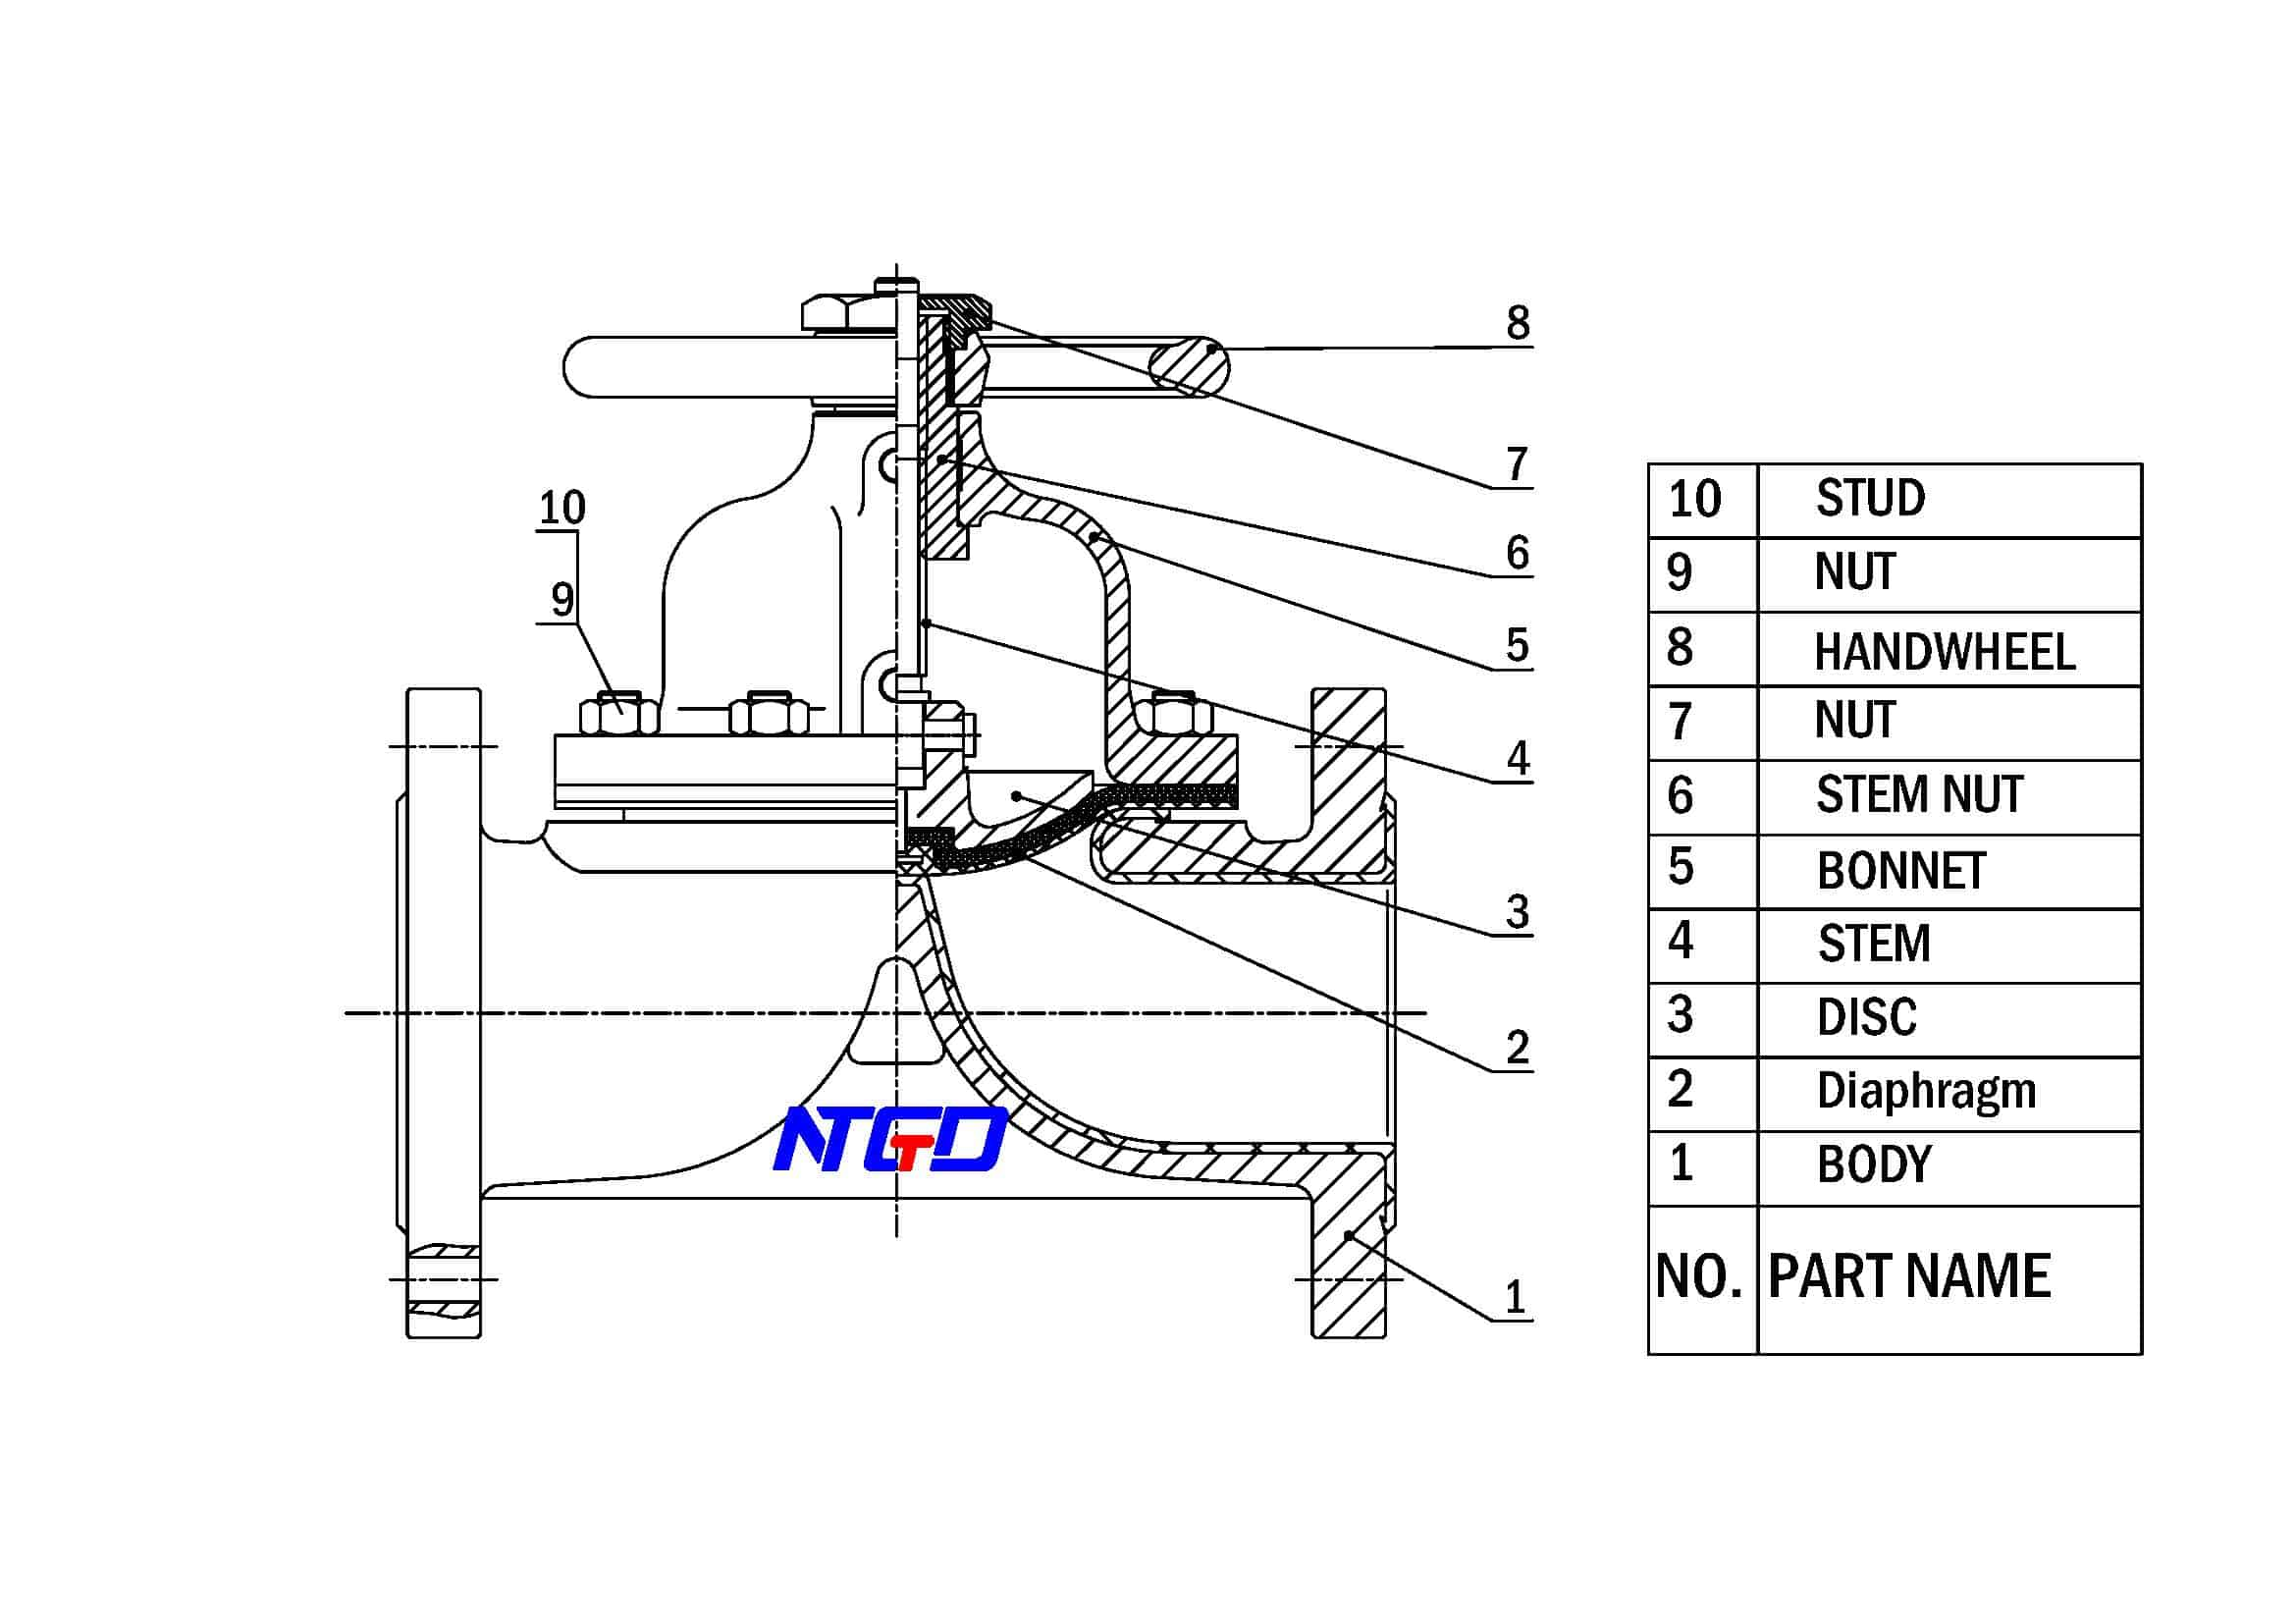 diaphragm valve drawing